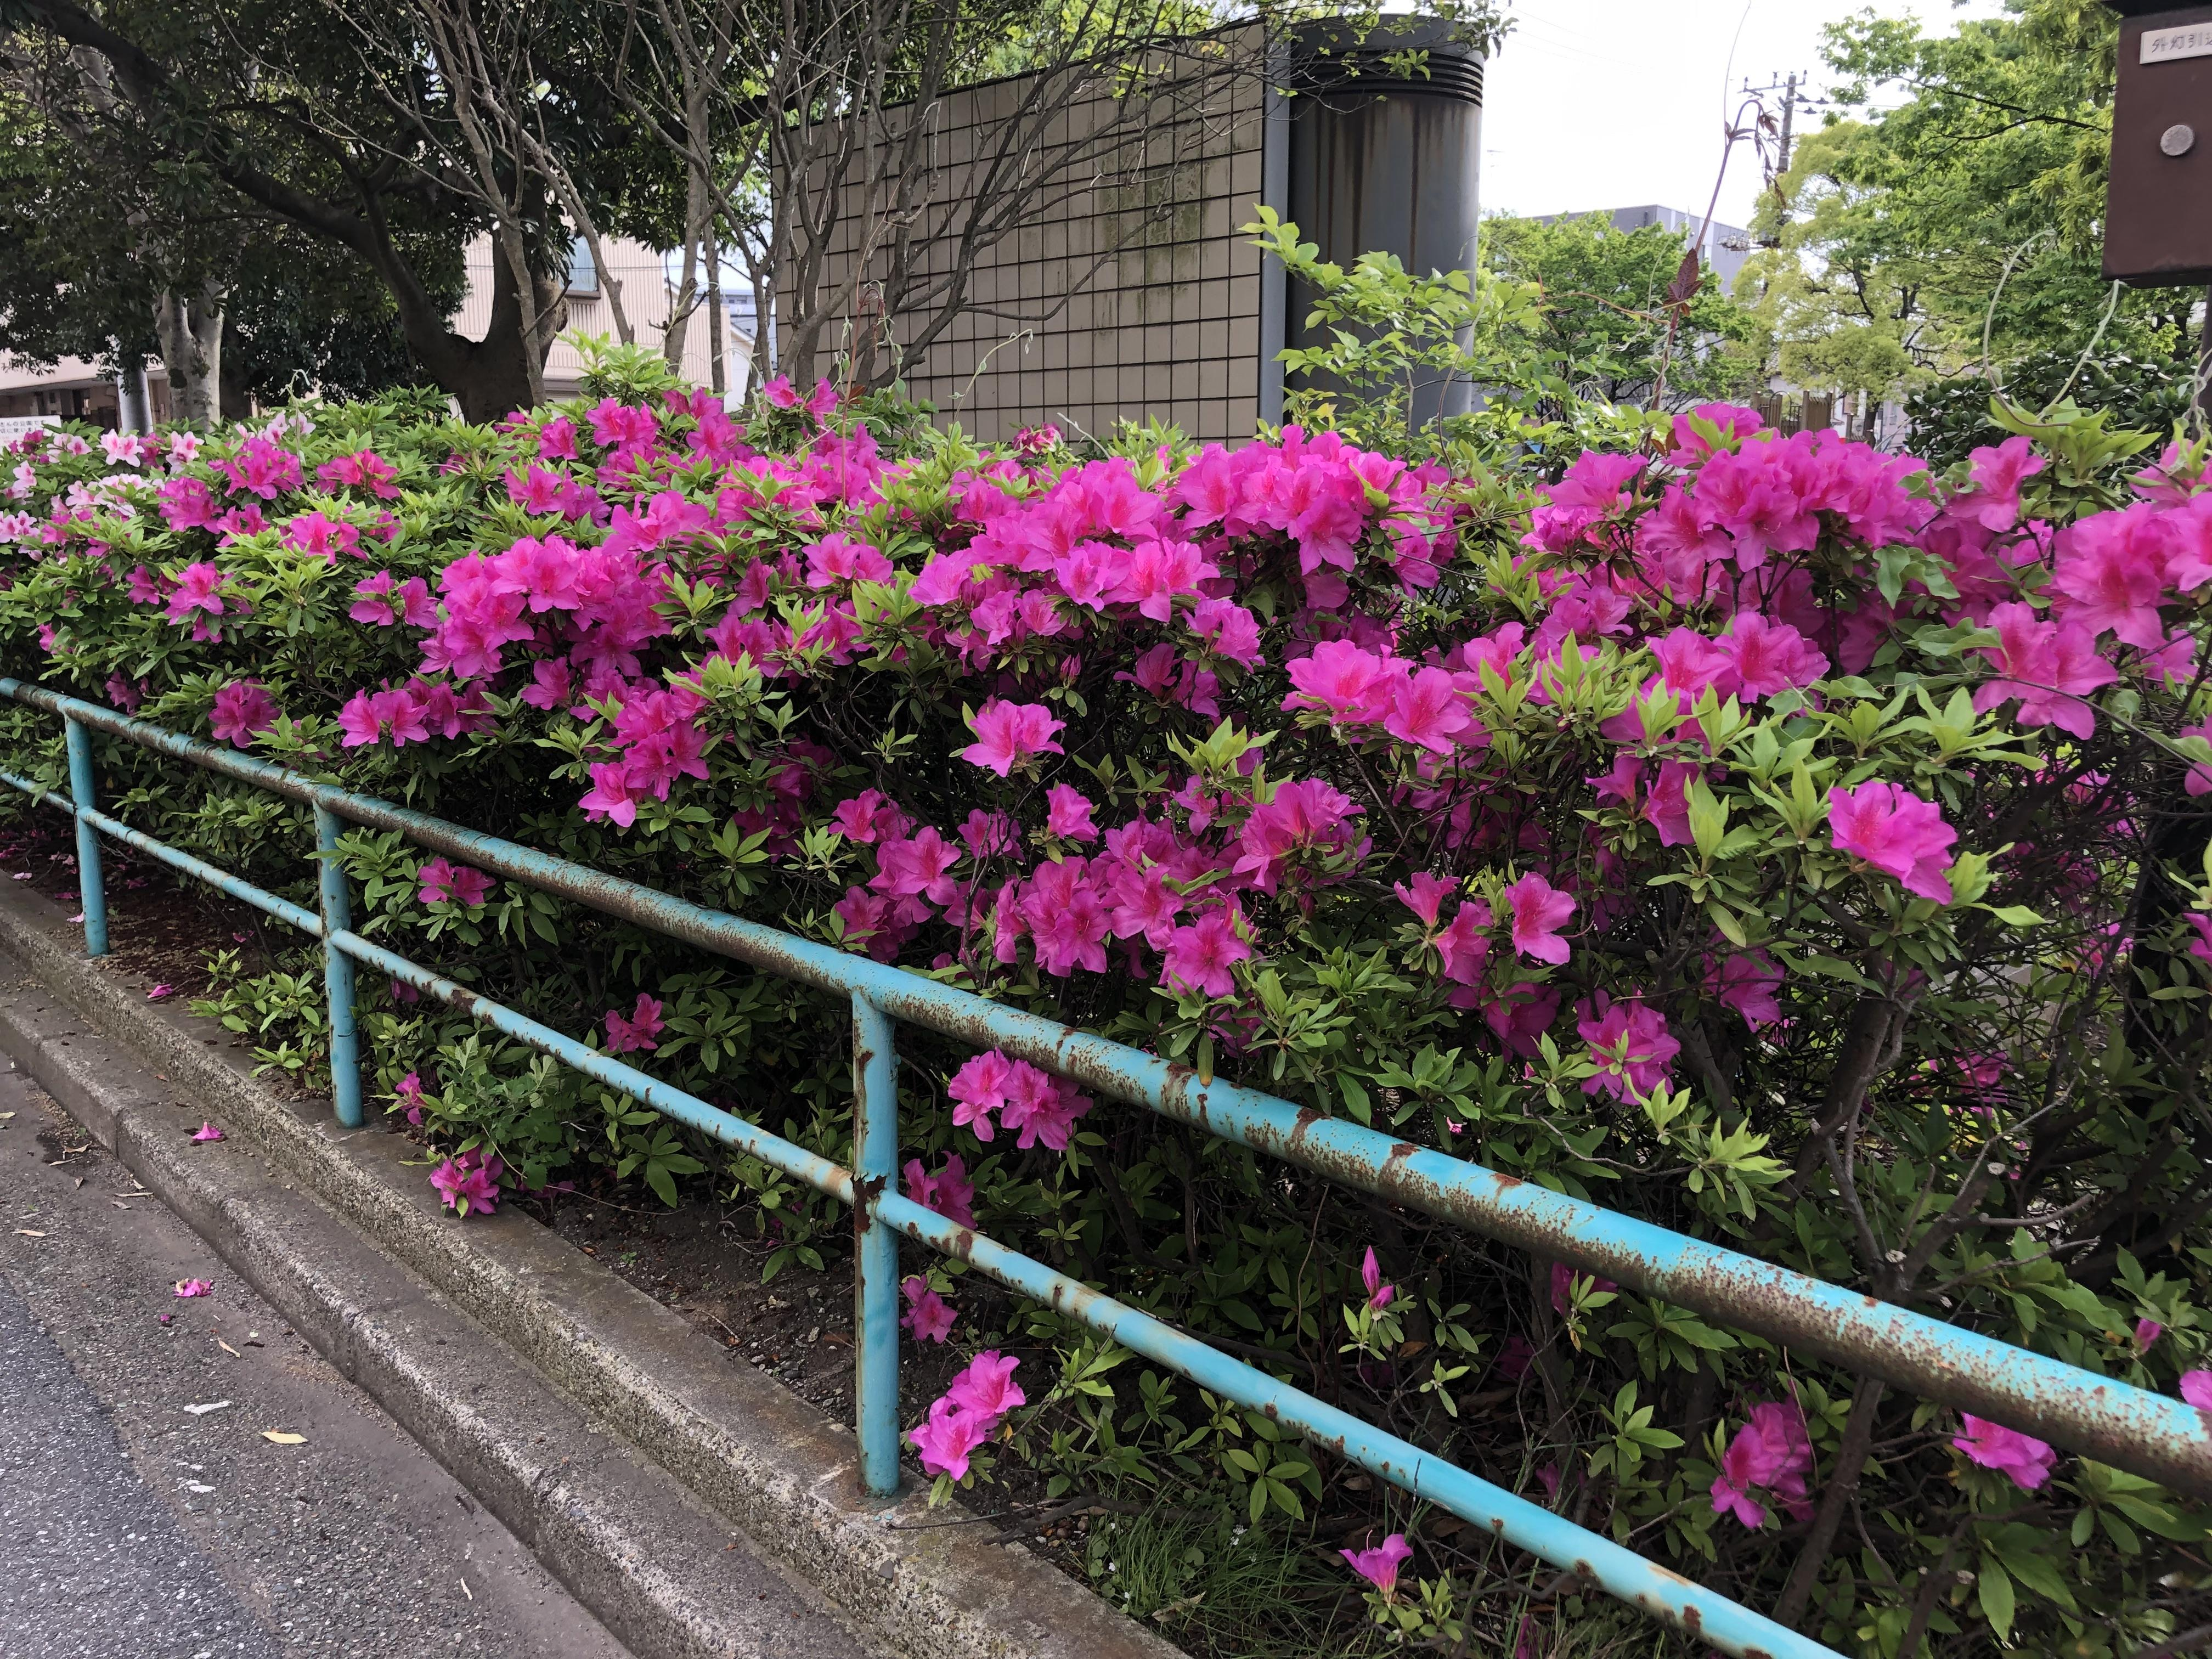 https://www.furusatoen.jp/blog/sanpo/2019/05/IMG_4061%5B1%5D.JPG